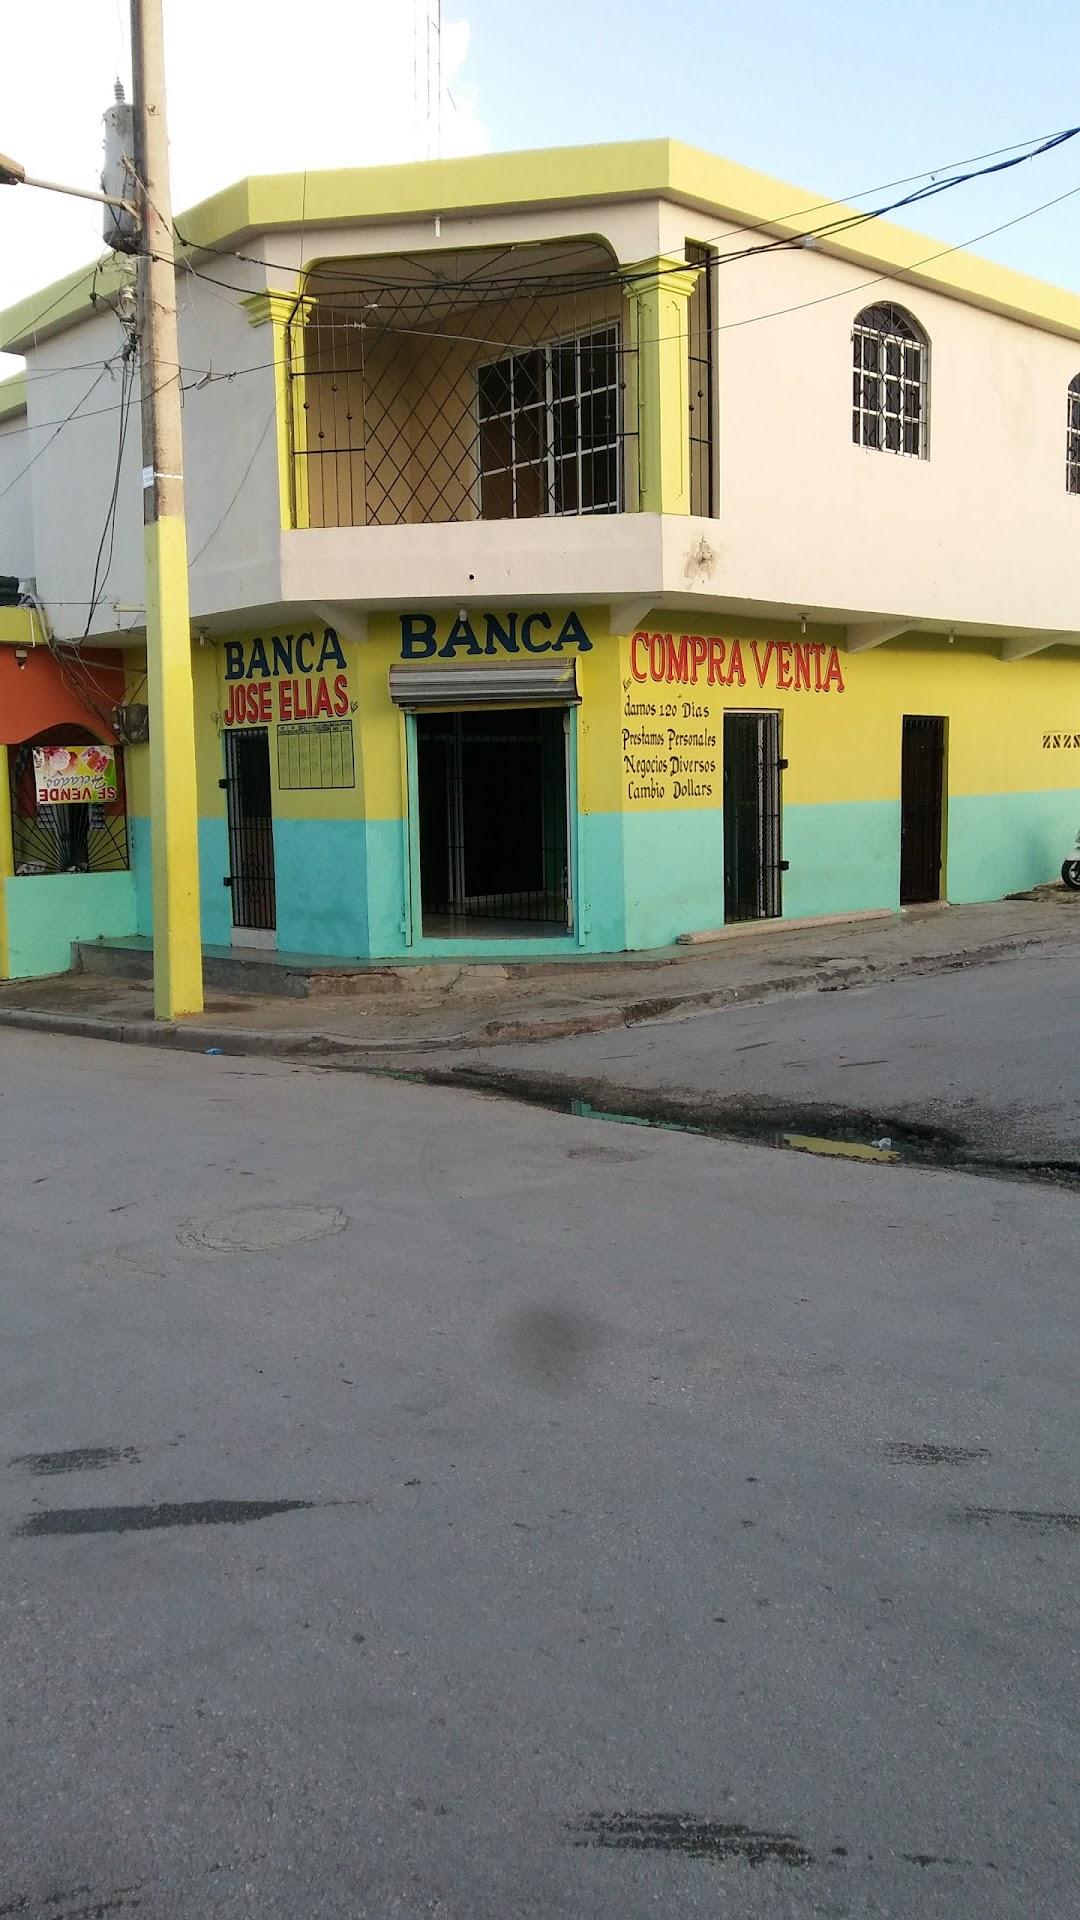 Banca De Loterias Jose Elias